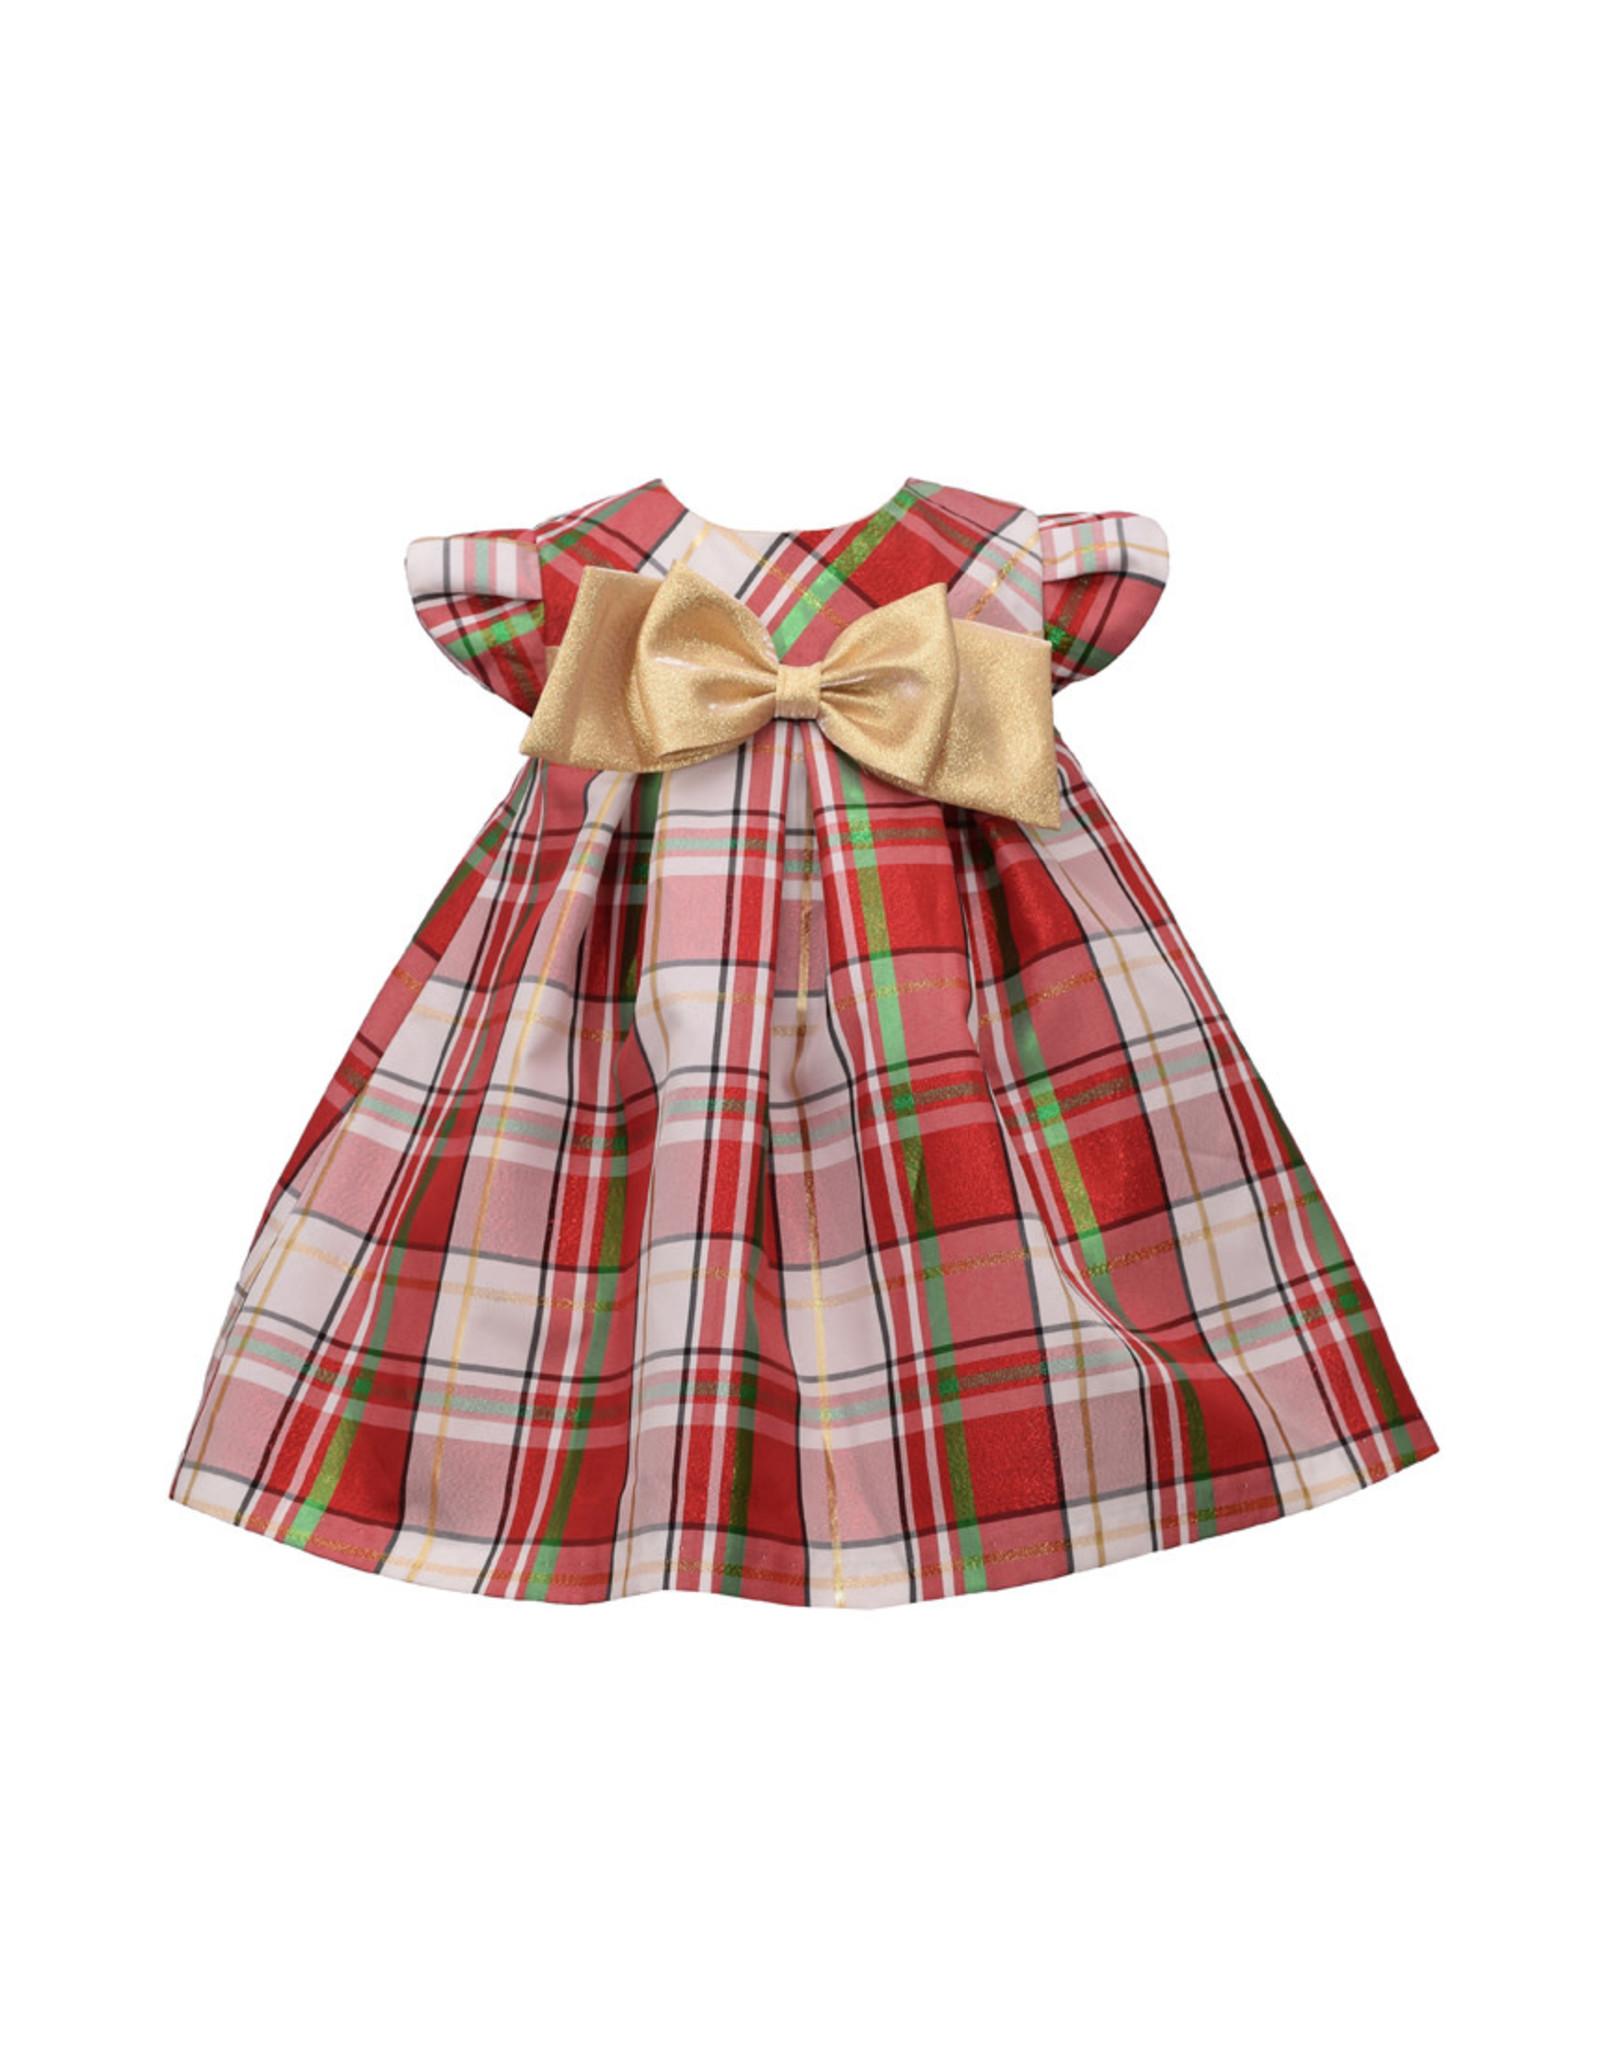 Bonnie  Jean Bonnie Jean- Plaid Taffeta Trapeze Dress